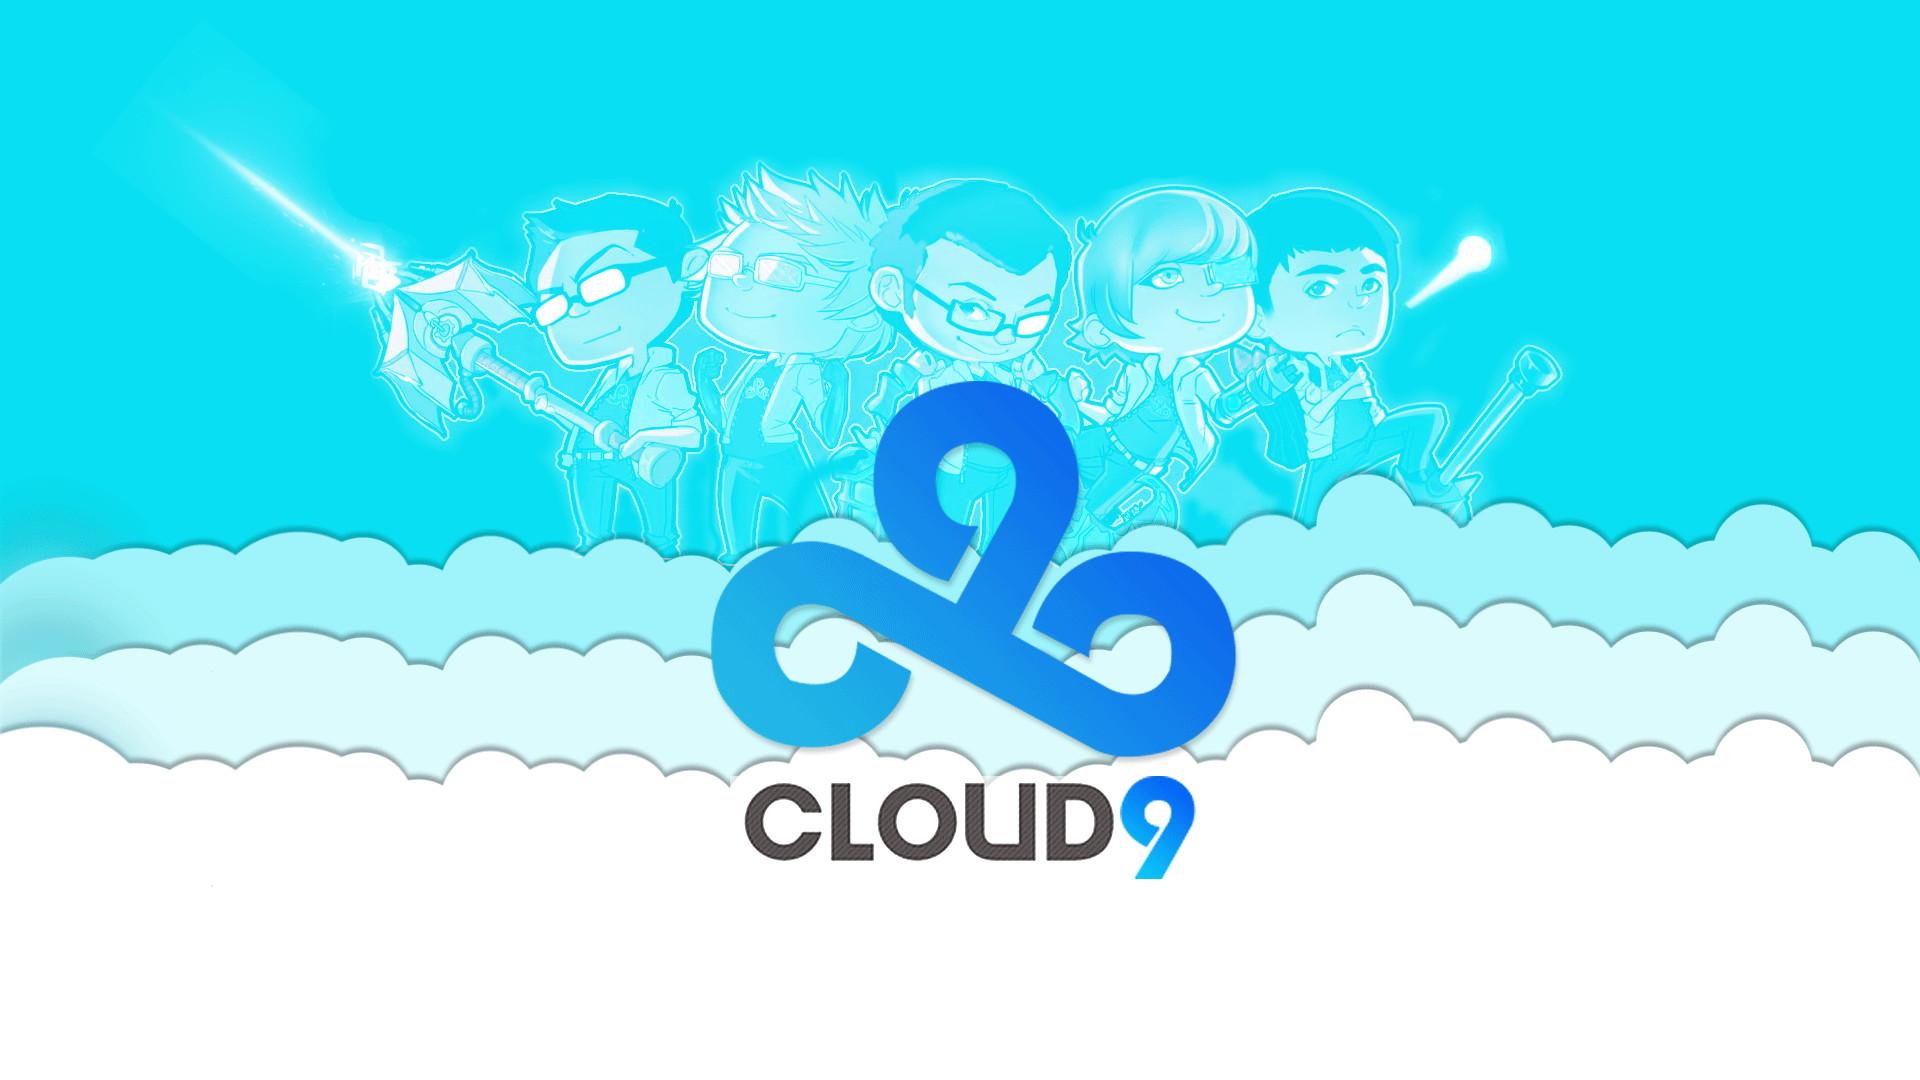 … Cloud 9 Wallpaper HD 1920*1080p by SKEDVIN